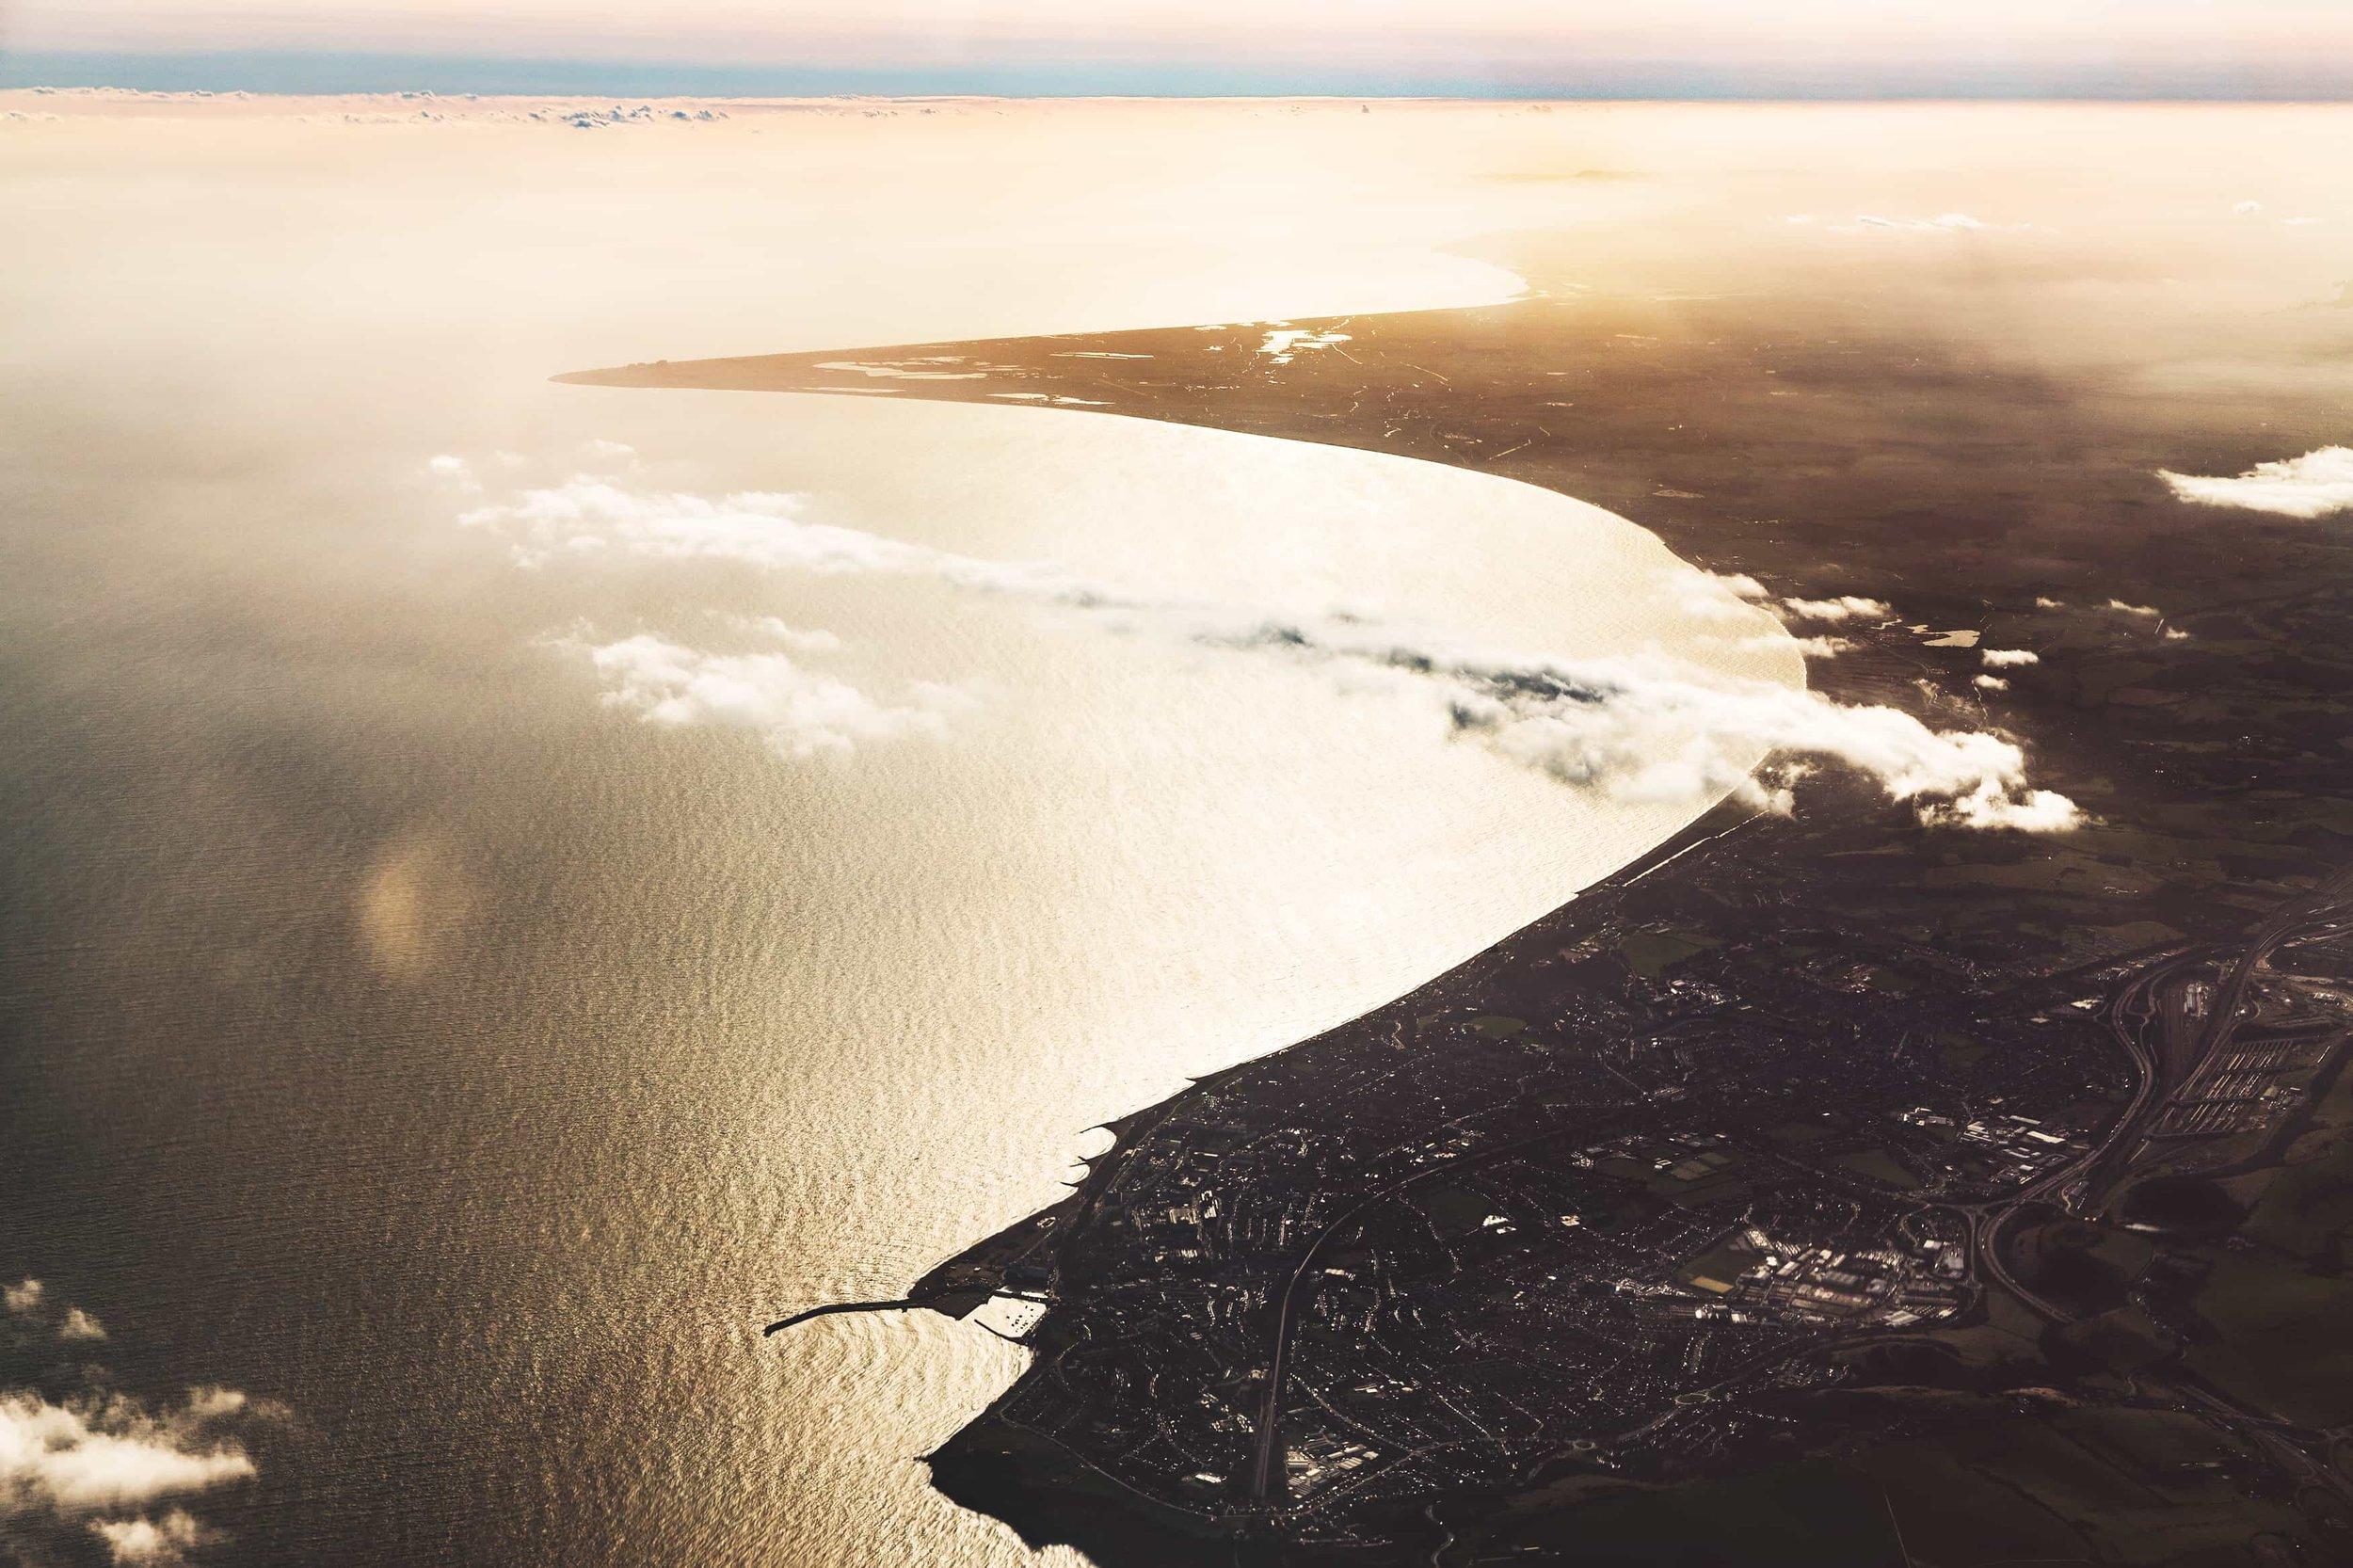 aerial_landscape_photography_fabio_burrelli_photographer_8.jpg